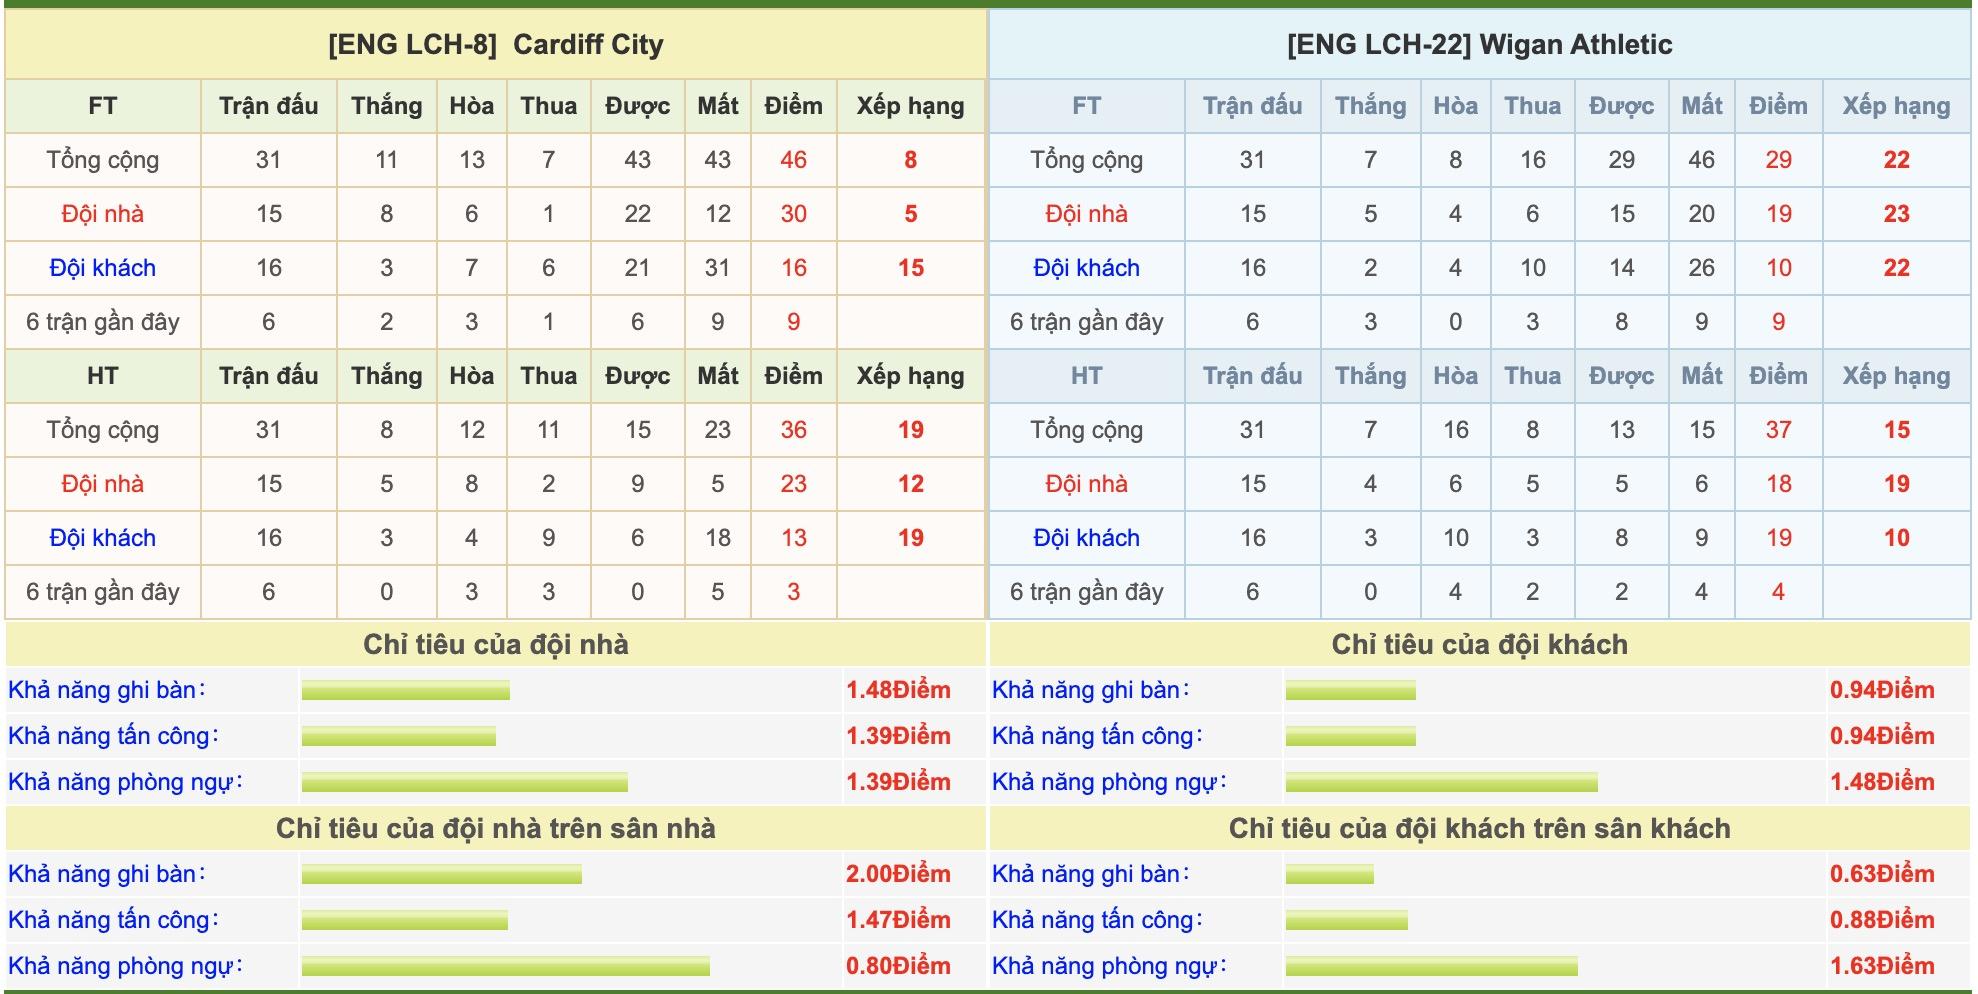 cardiff-city-vs-wigan-soi-keo-hang-nhat-anh-15-02-lot-o-phuc-kich-6